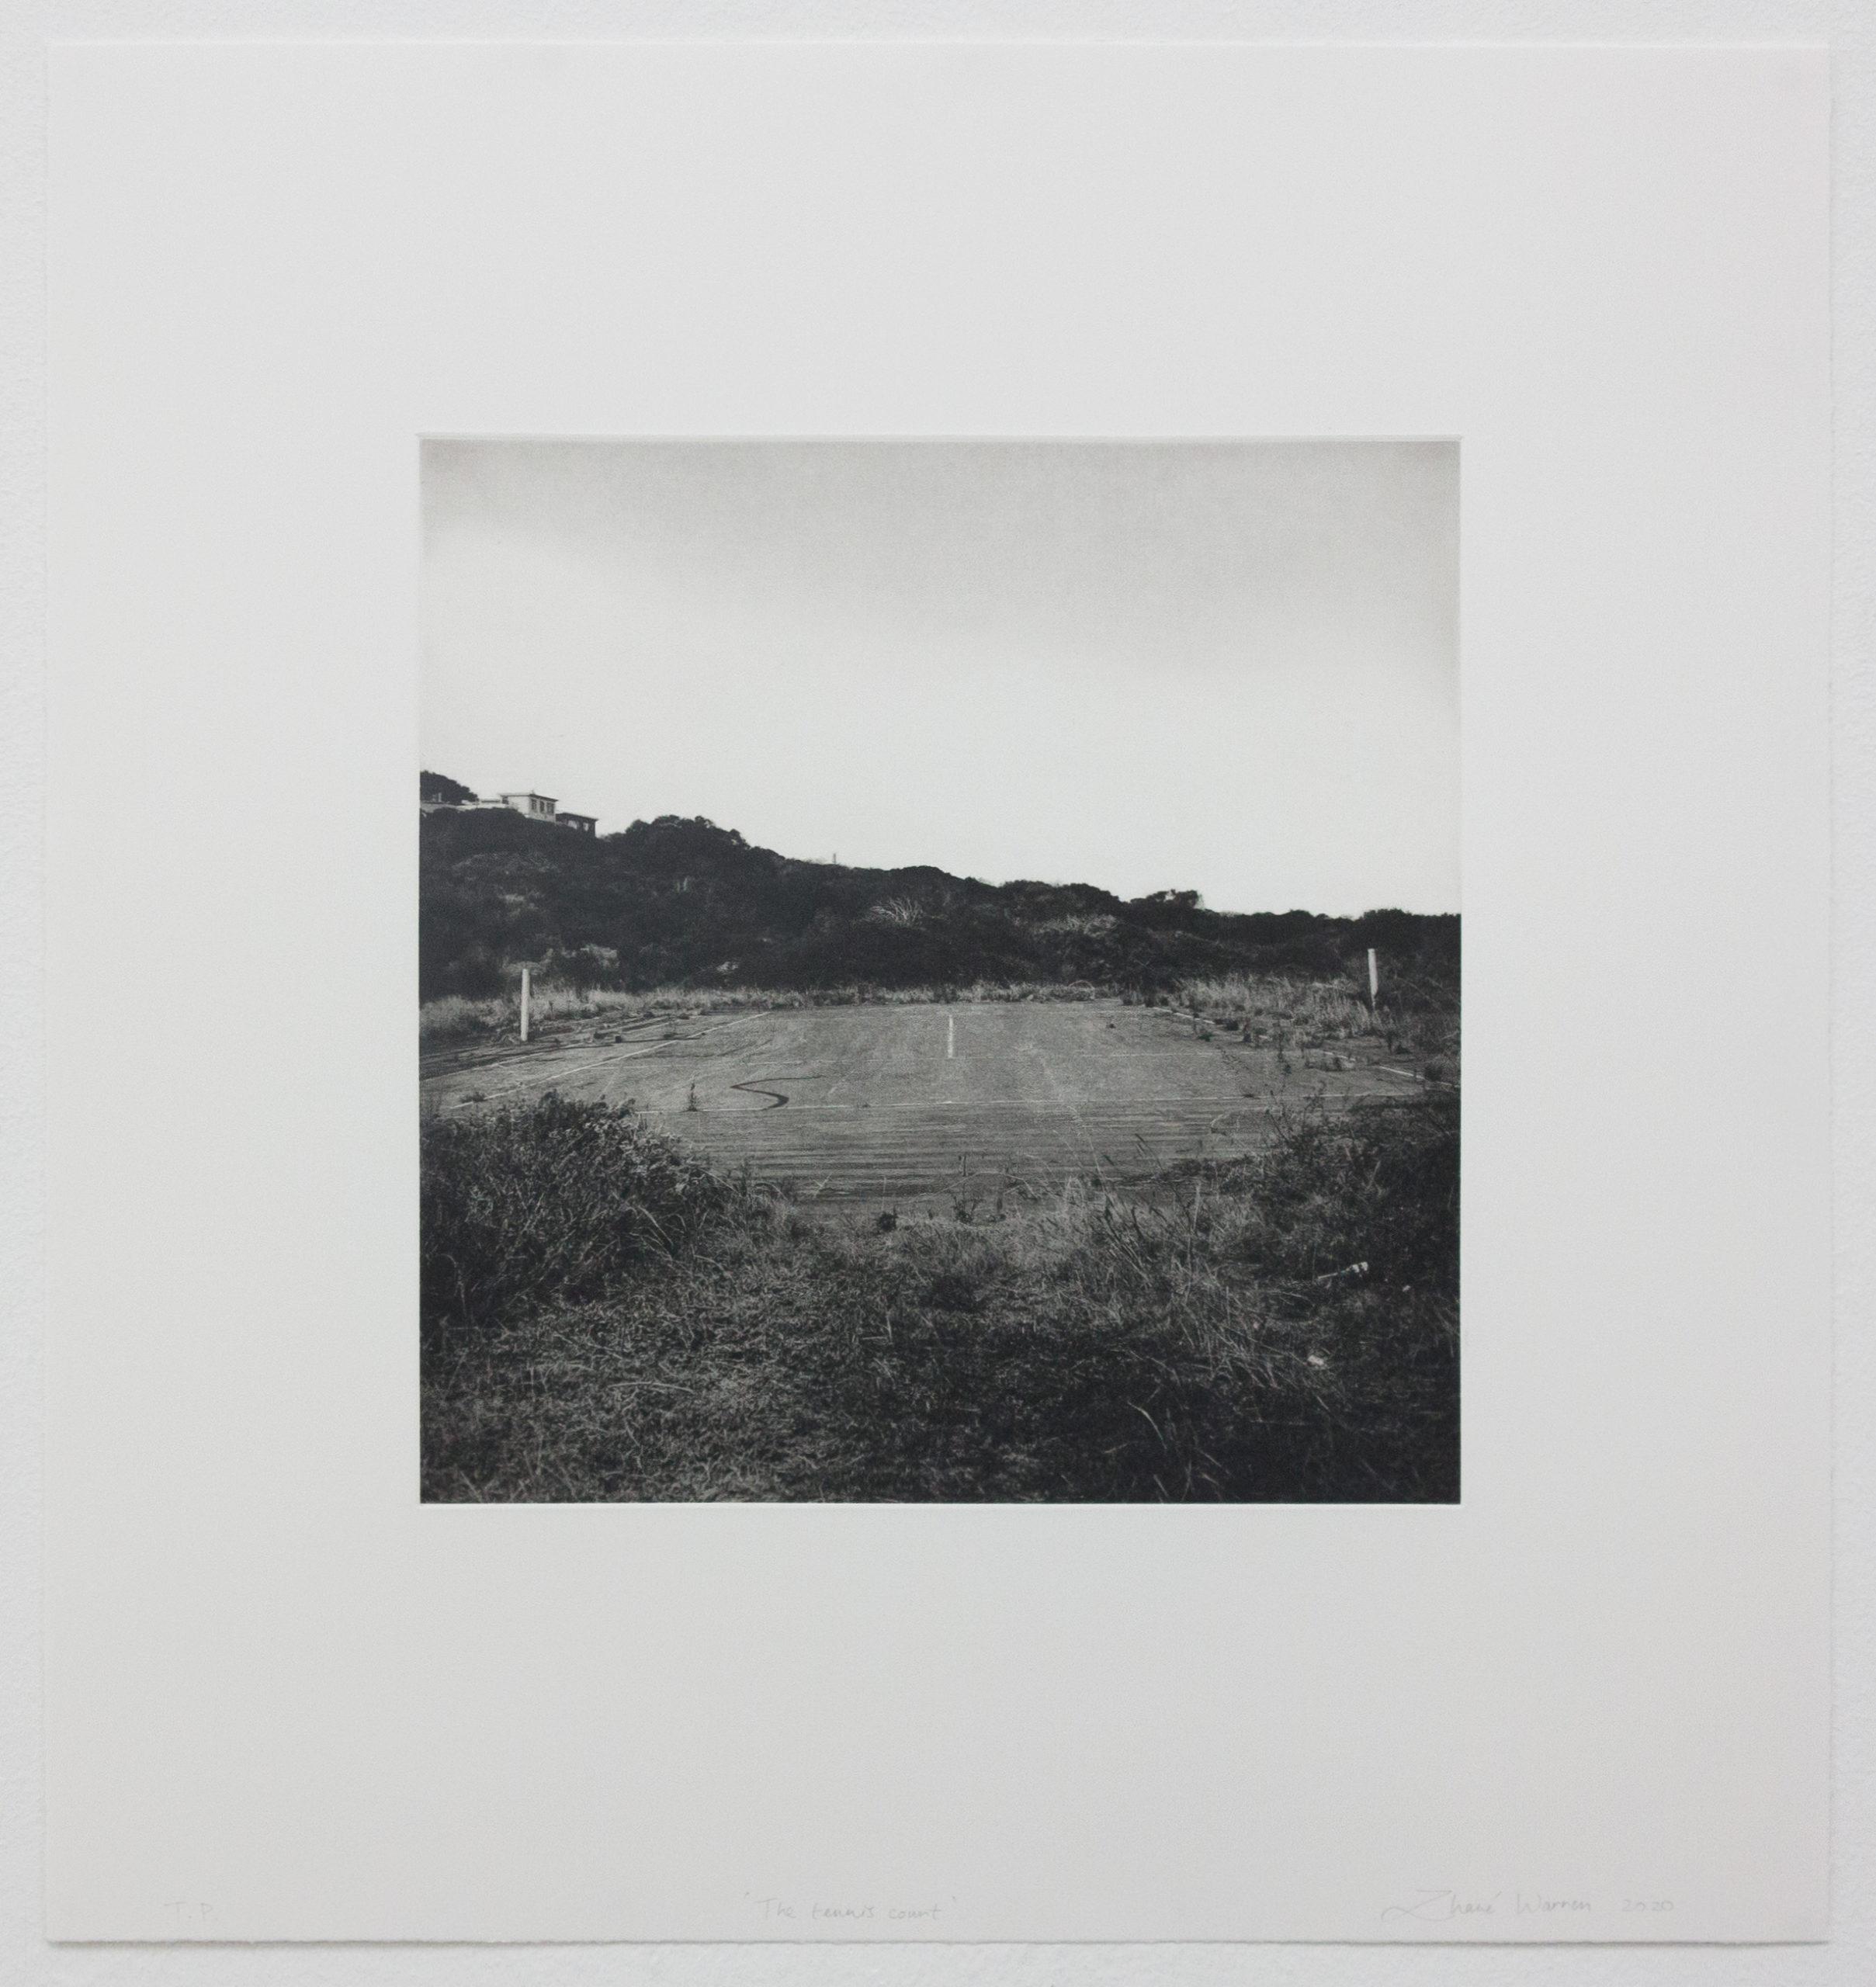 Zhané Warren, Prints, Photogravure